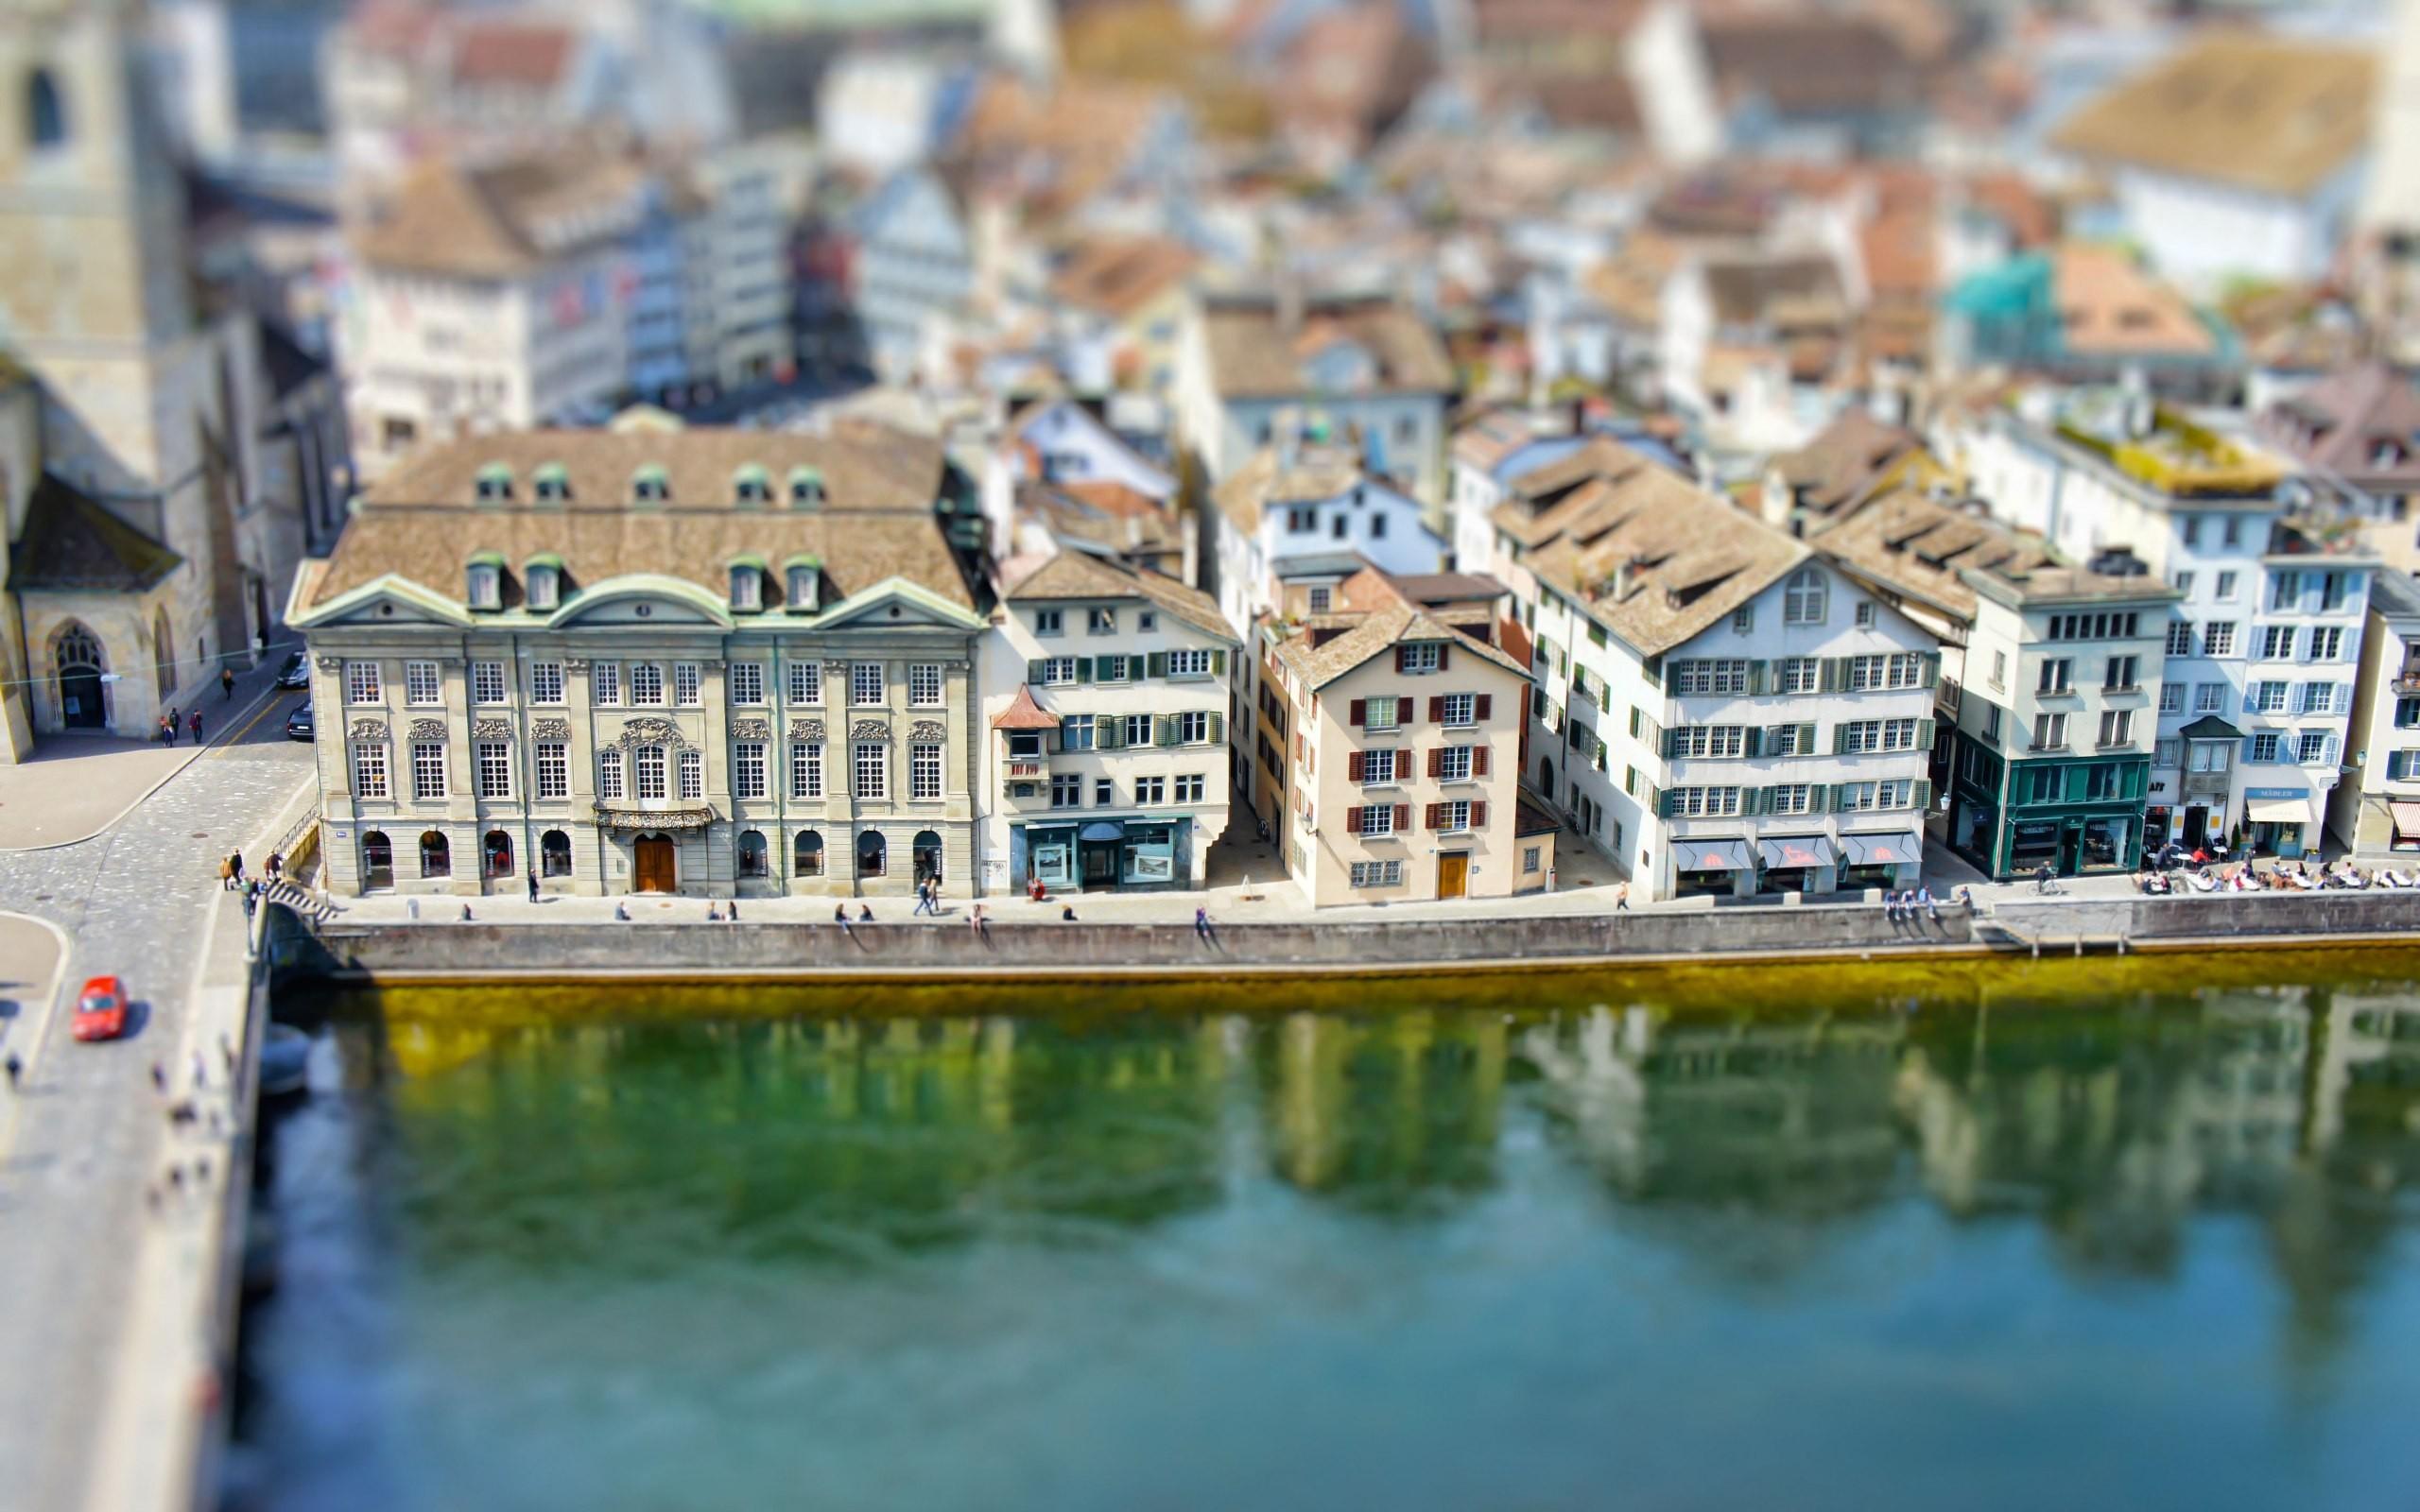 Tilt Shift Switzerland Cityscape River Europe Architecture Building Old Building Reflection Zurich 2560x1600